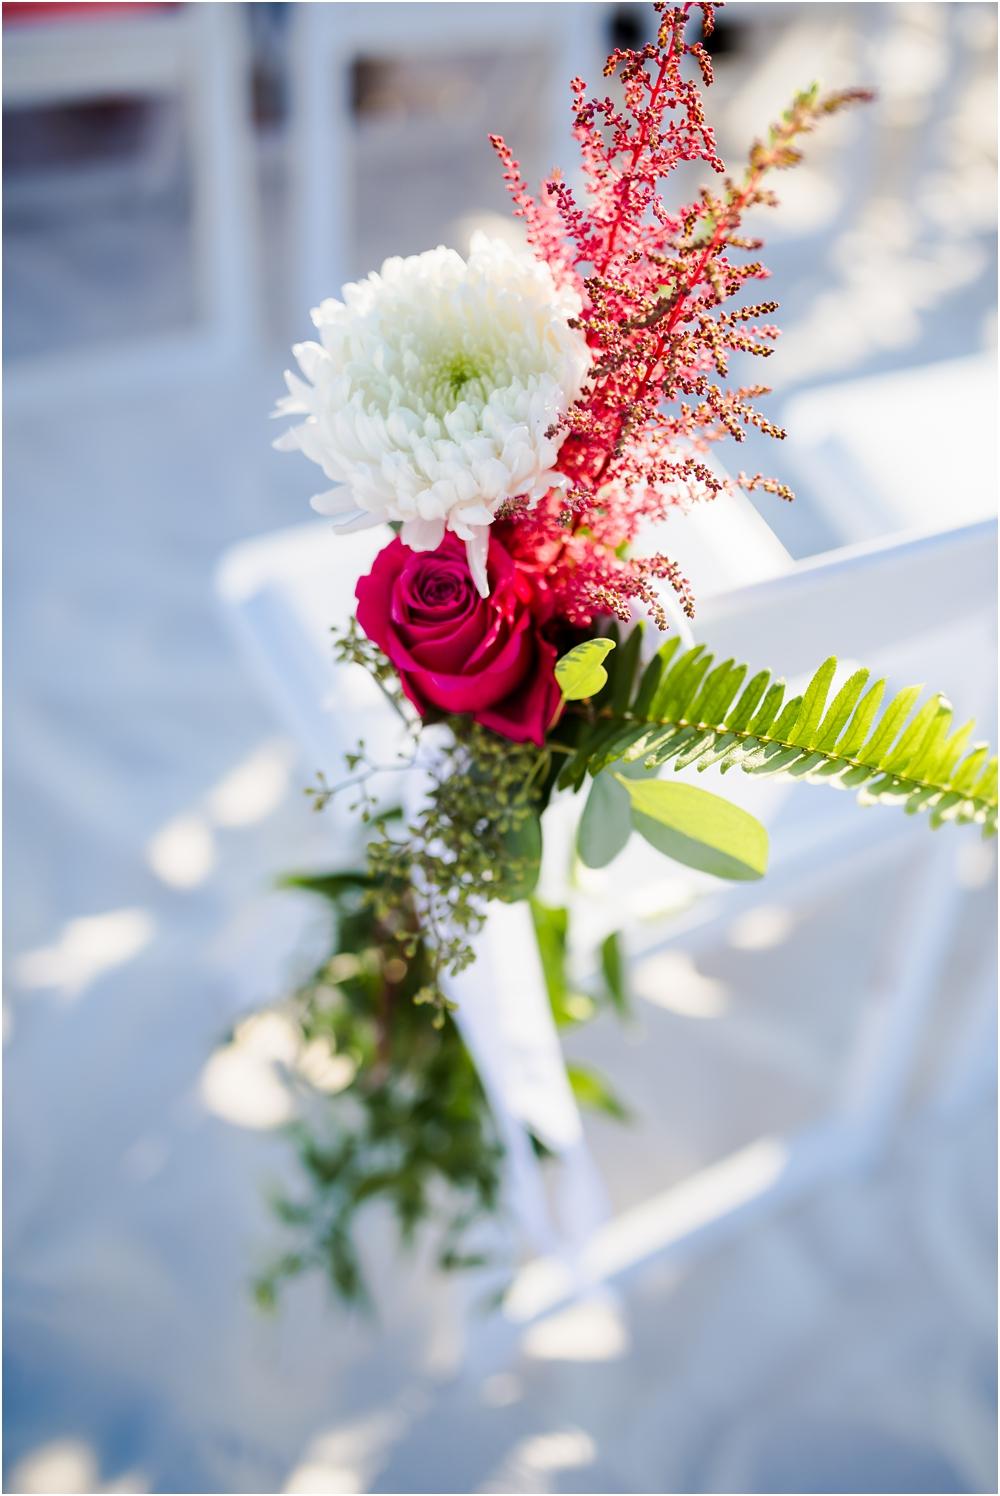 mcglothlin-wedding-kiersten-stevenson-photography-30a-panama-city-beach-dothan-tallahassee-(75-of-145).jpg